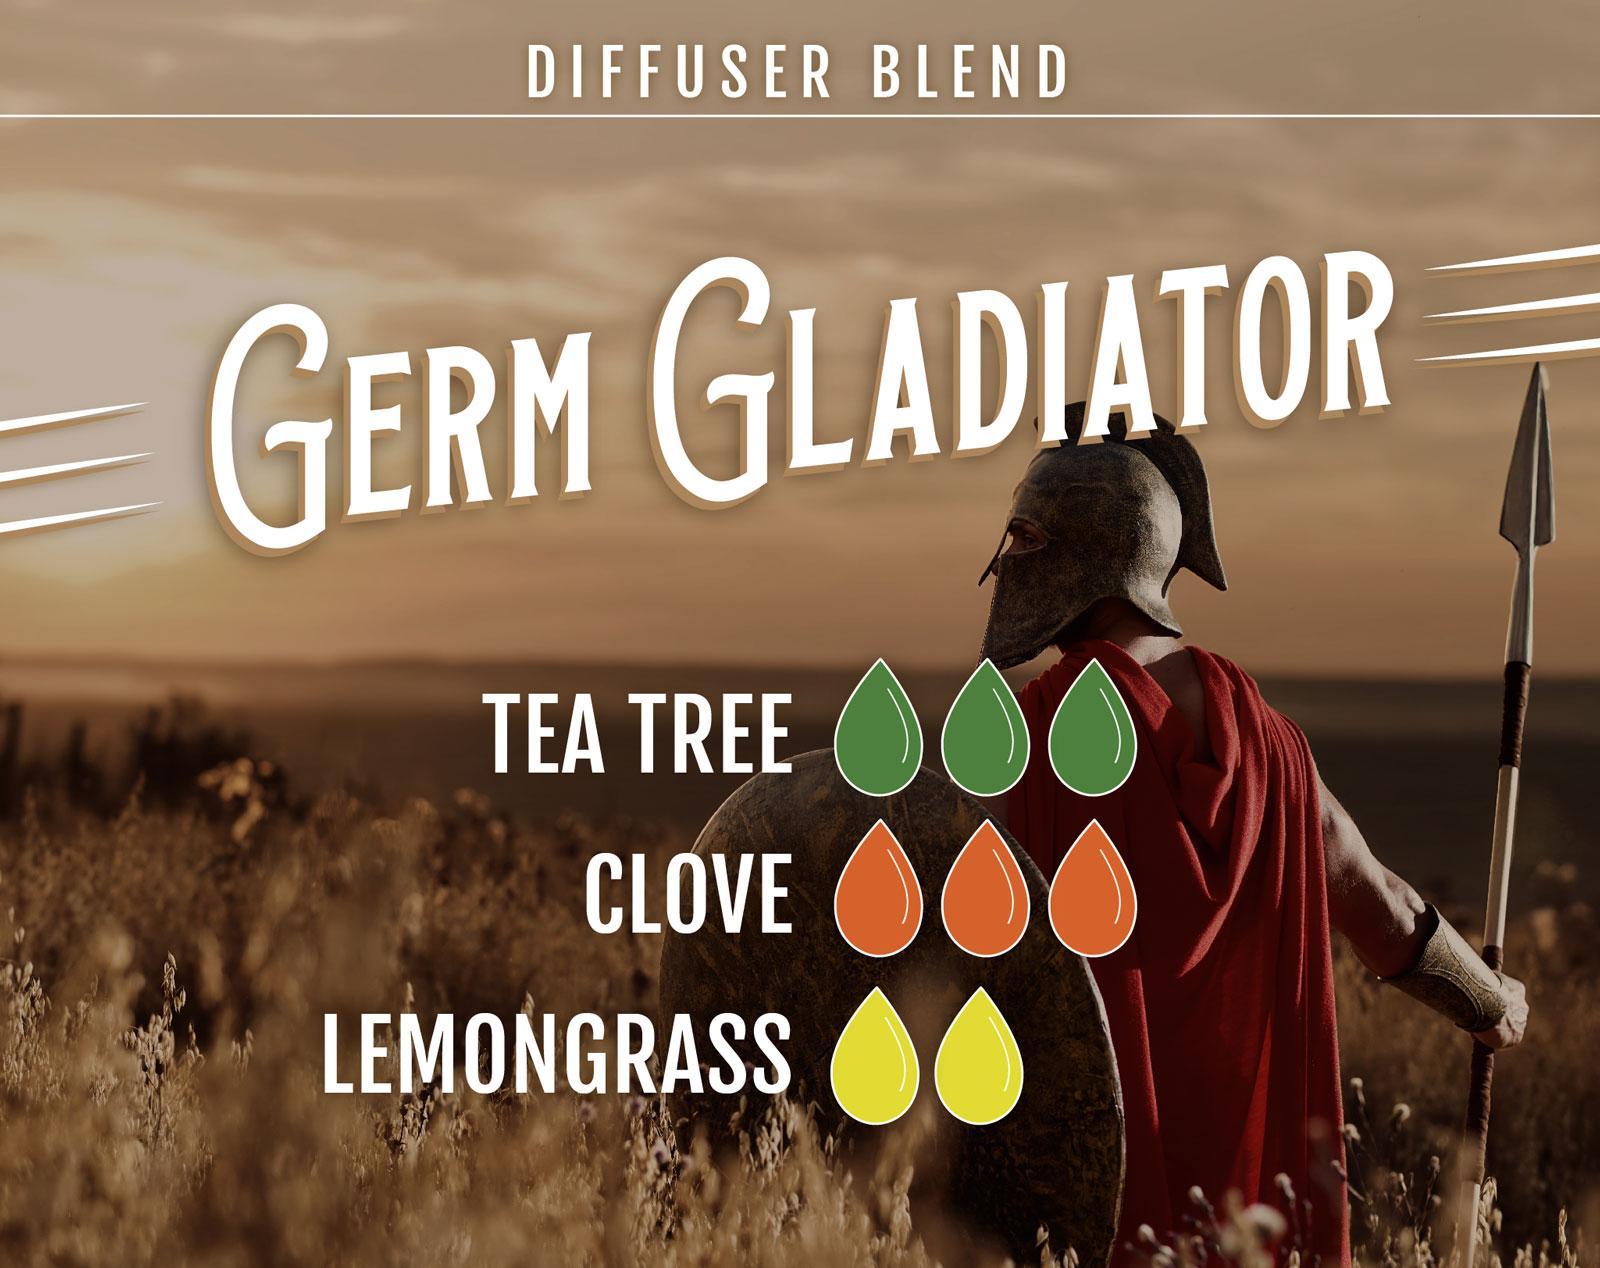 Tea Tree Essential Oil Diffuser Blend Germ Gladiator - 3 drops Tea Tree 3 drops Clove 2 drops Lemongrass